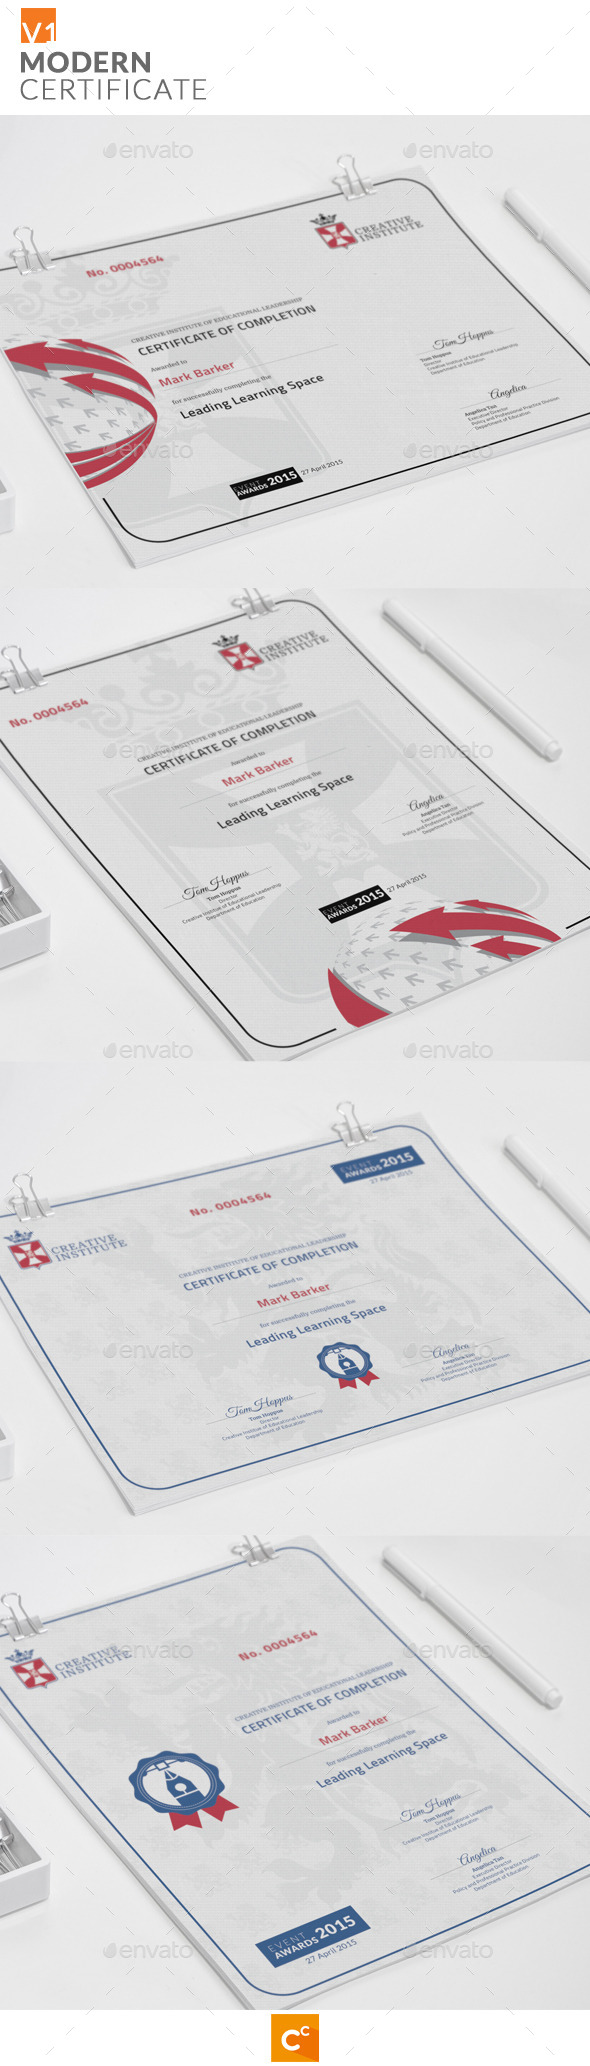 GraphicRiver Modern Certificate 11296365